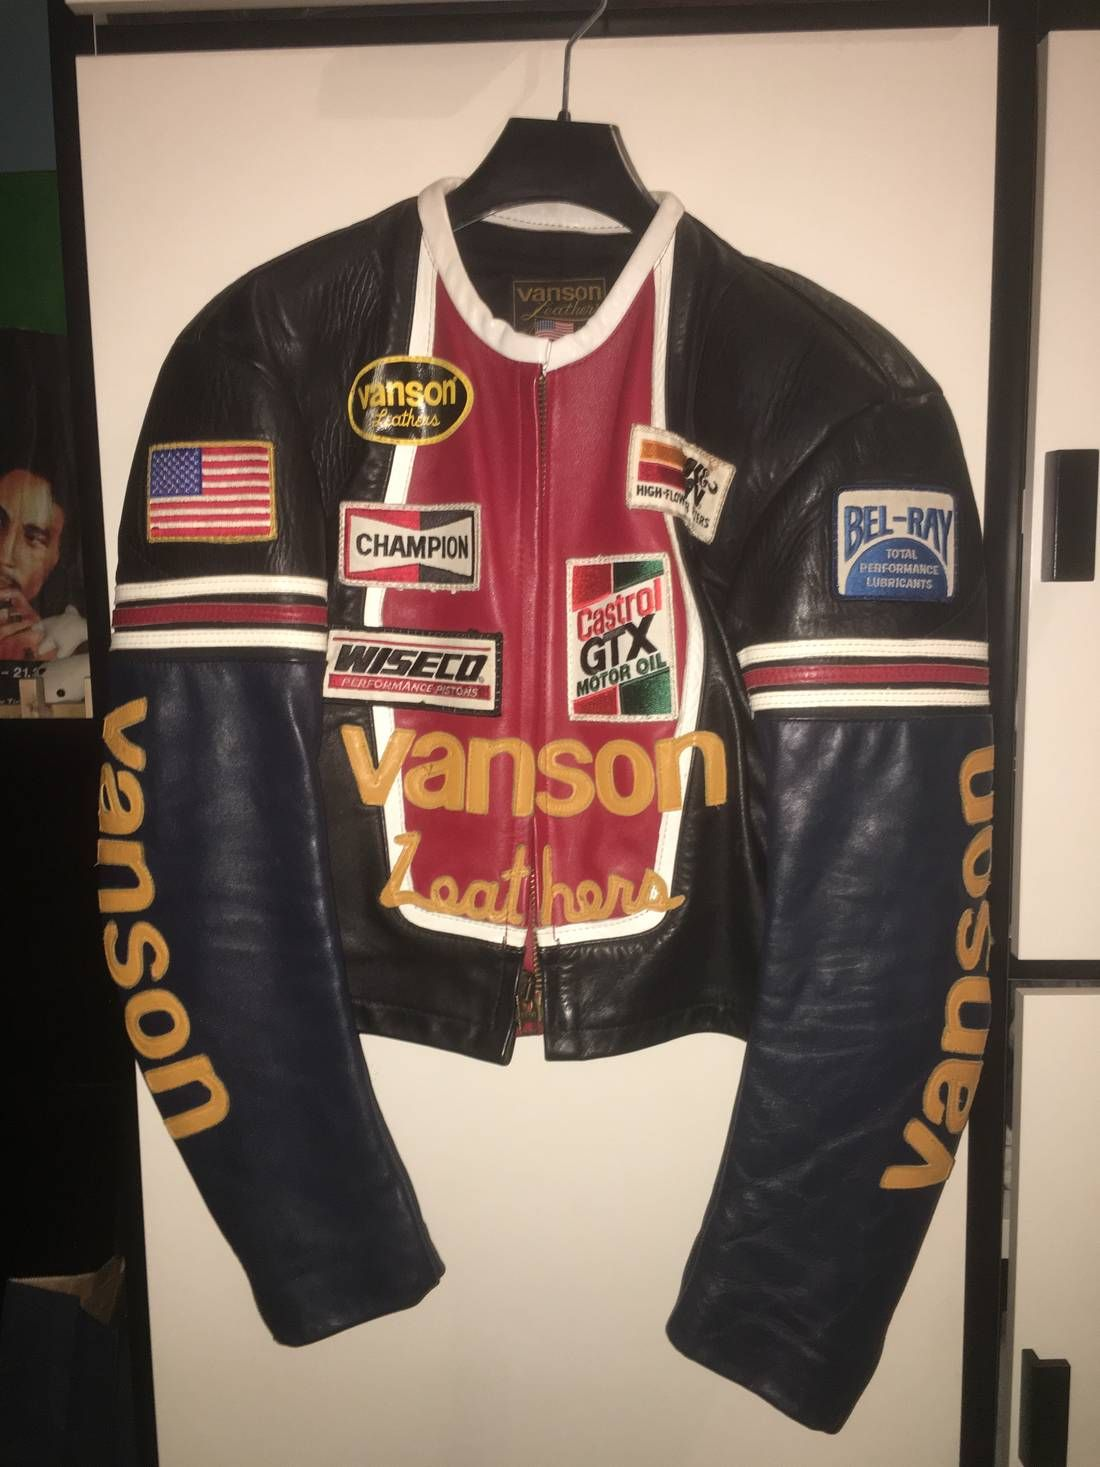 Vanson Leathers Vanson Star Leather Motorcycle Jacket